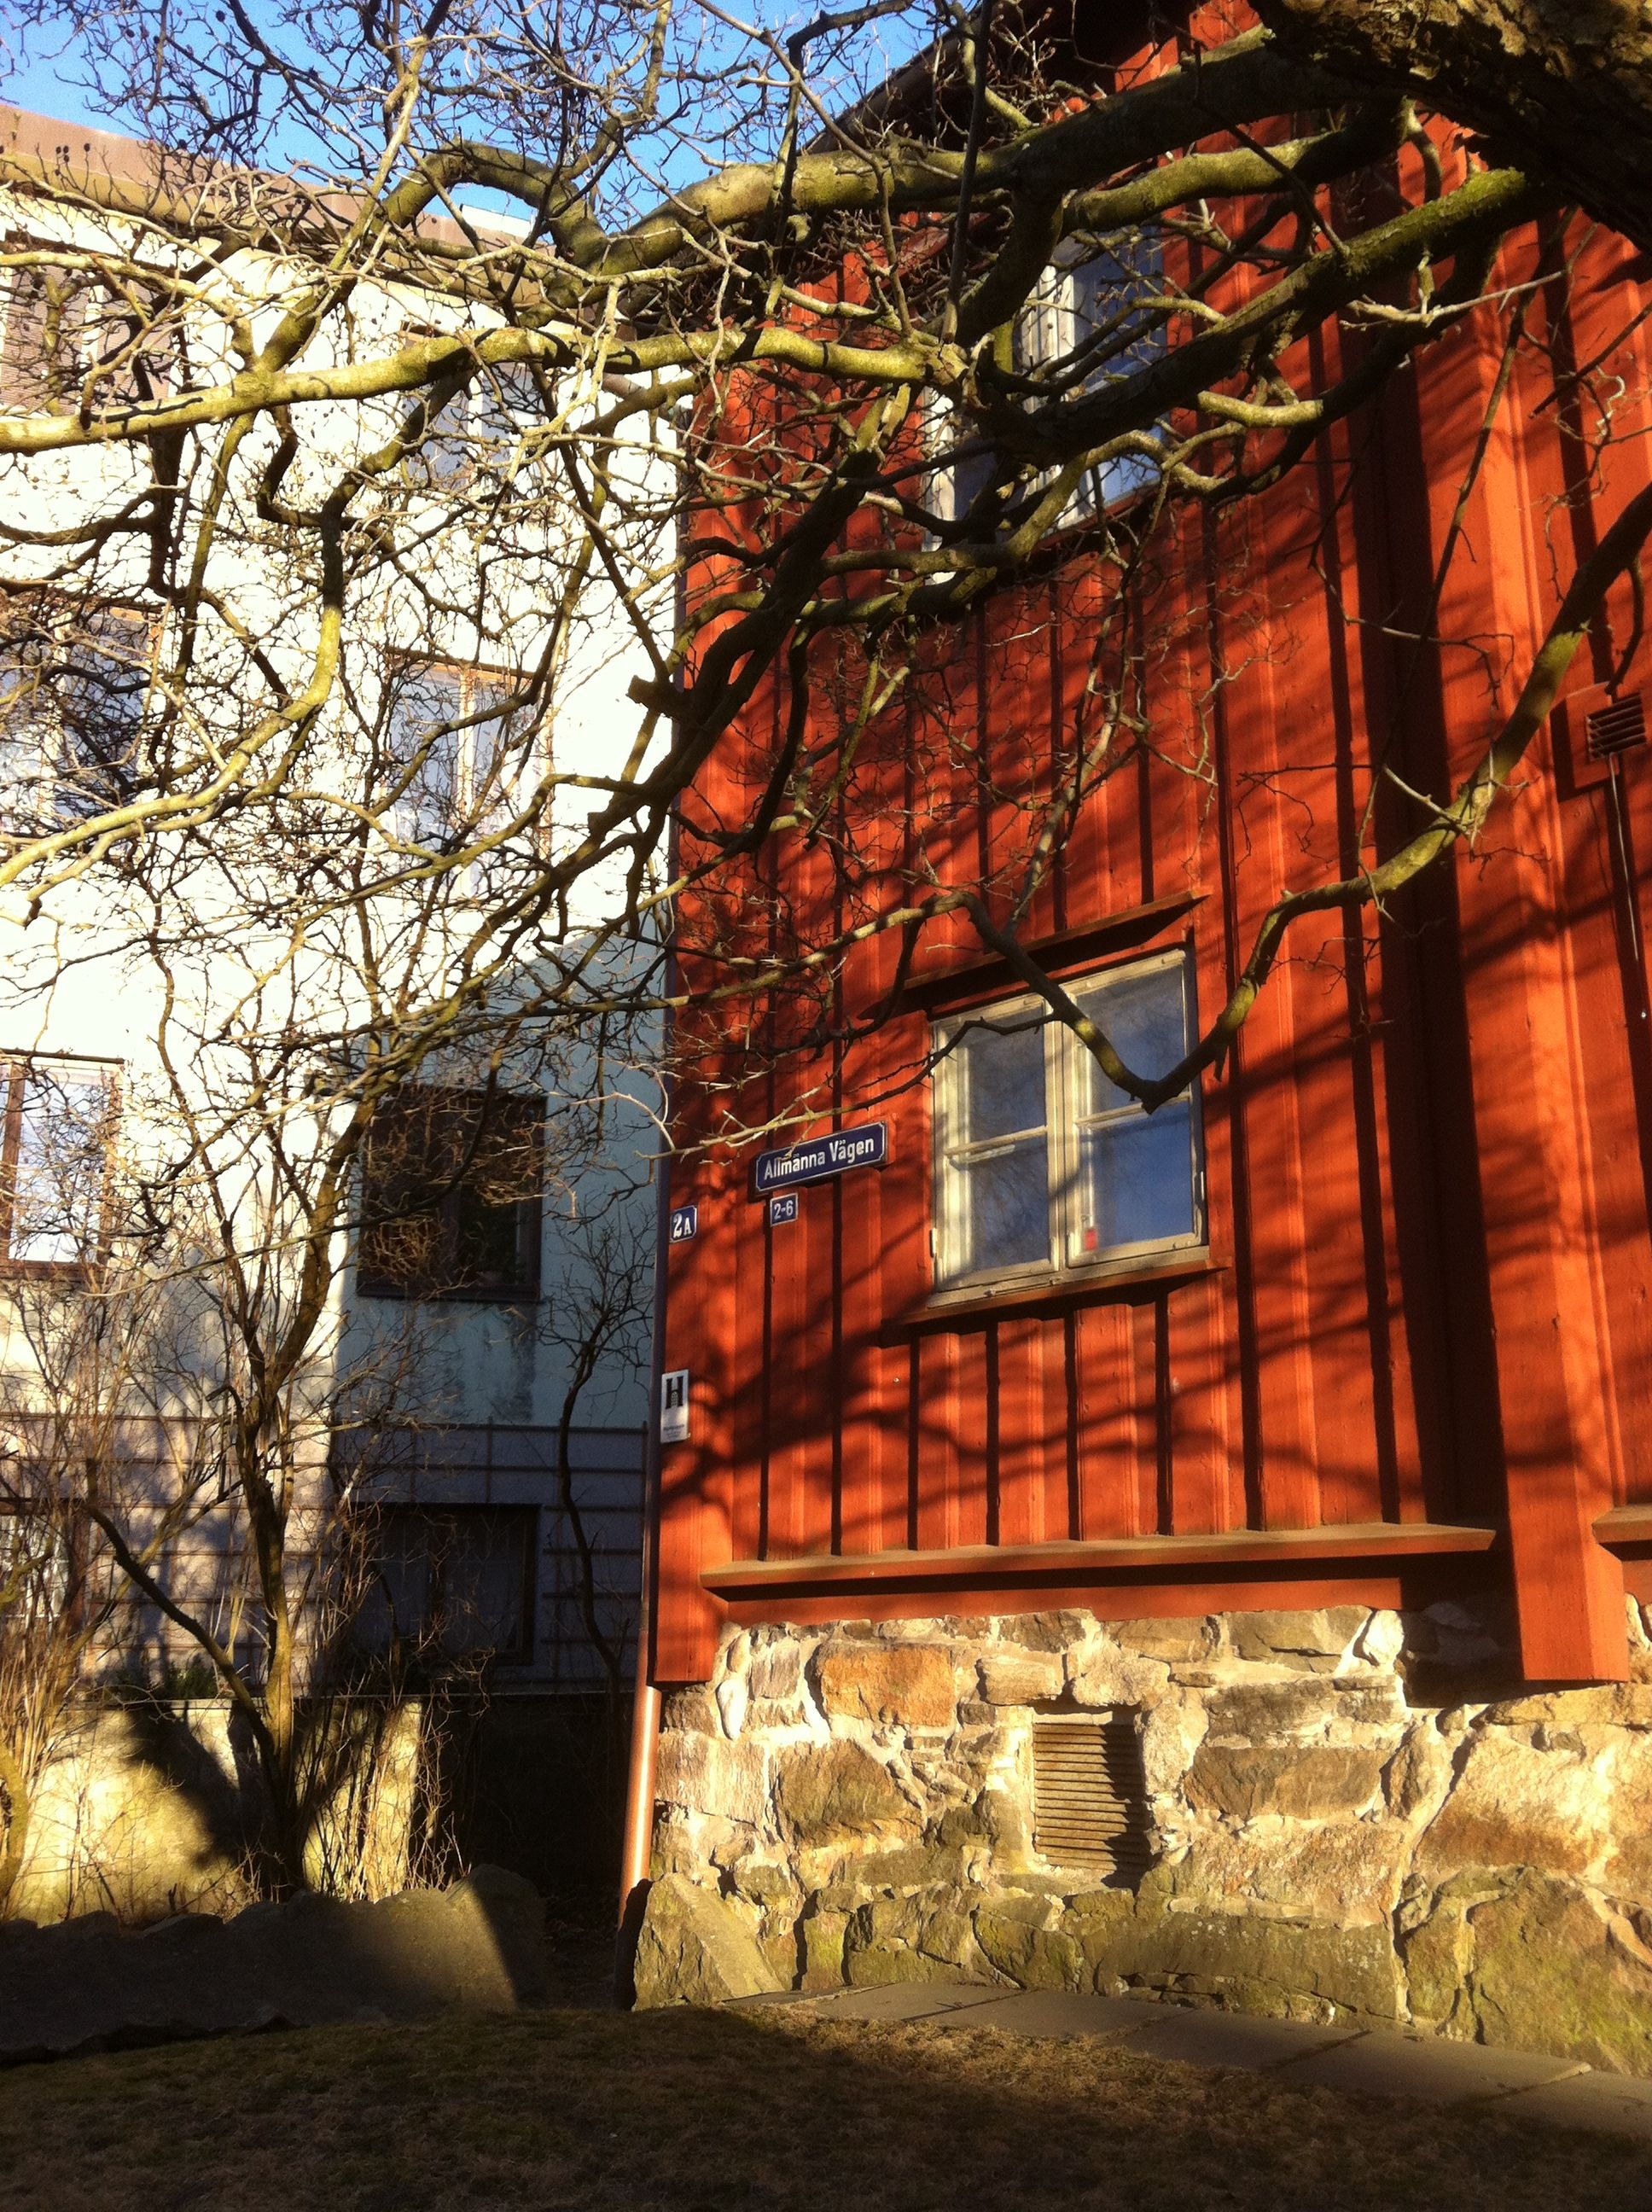 By Stigberg square in Gothenburg